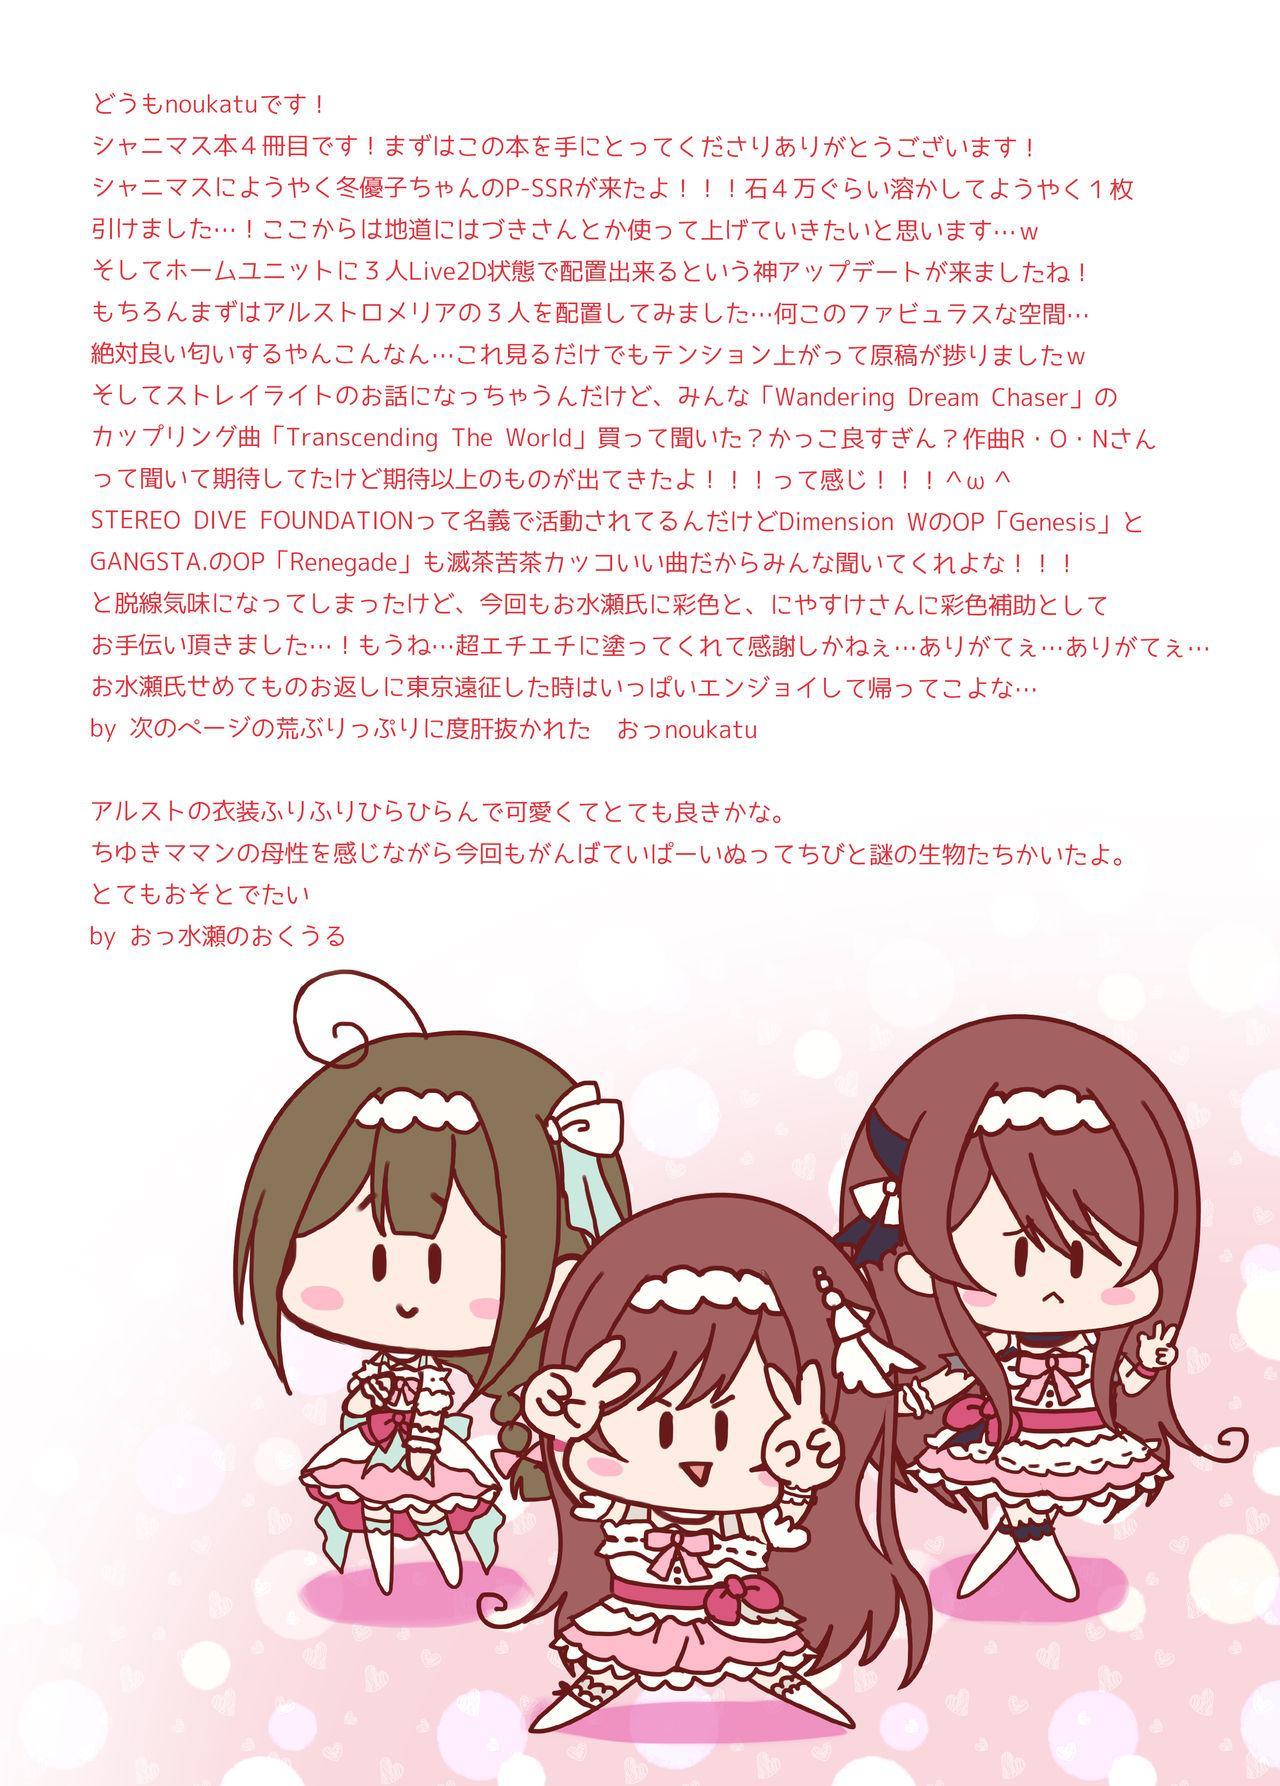 Shinymas Haramase Shuukai Play 4 12